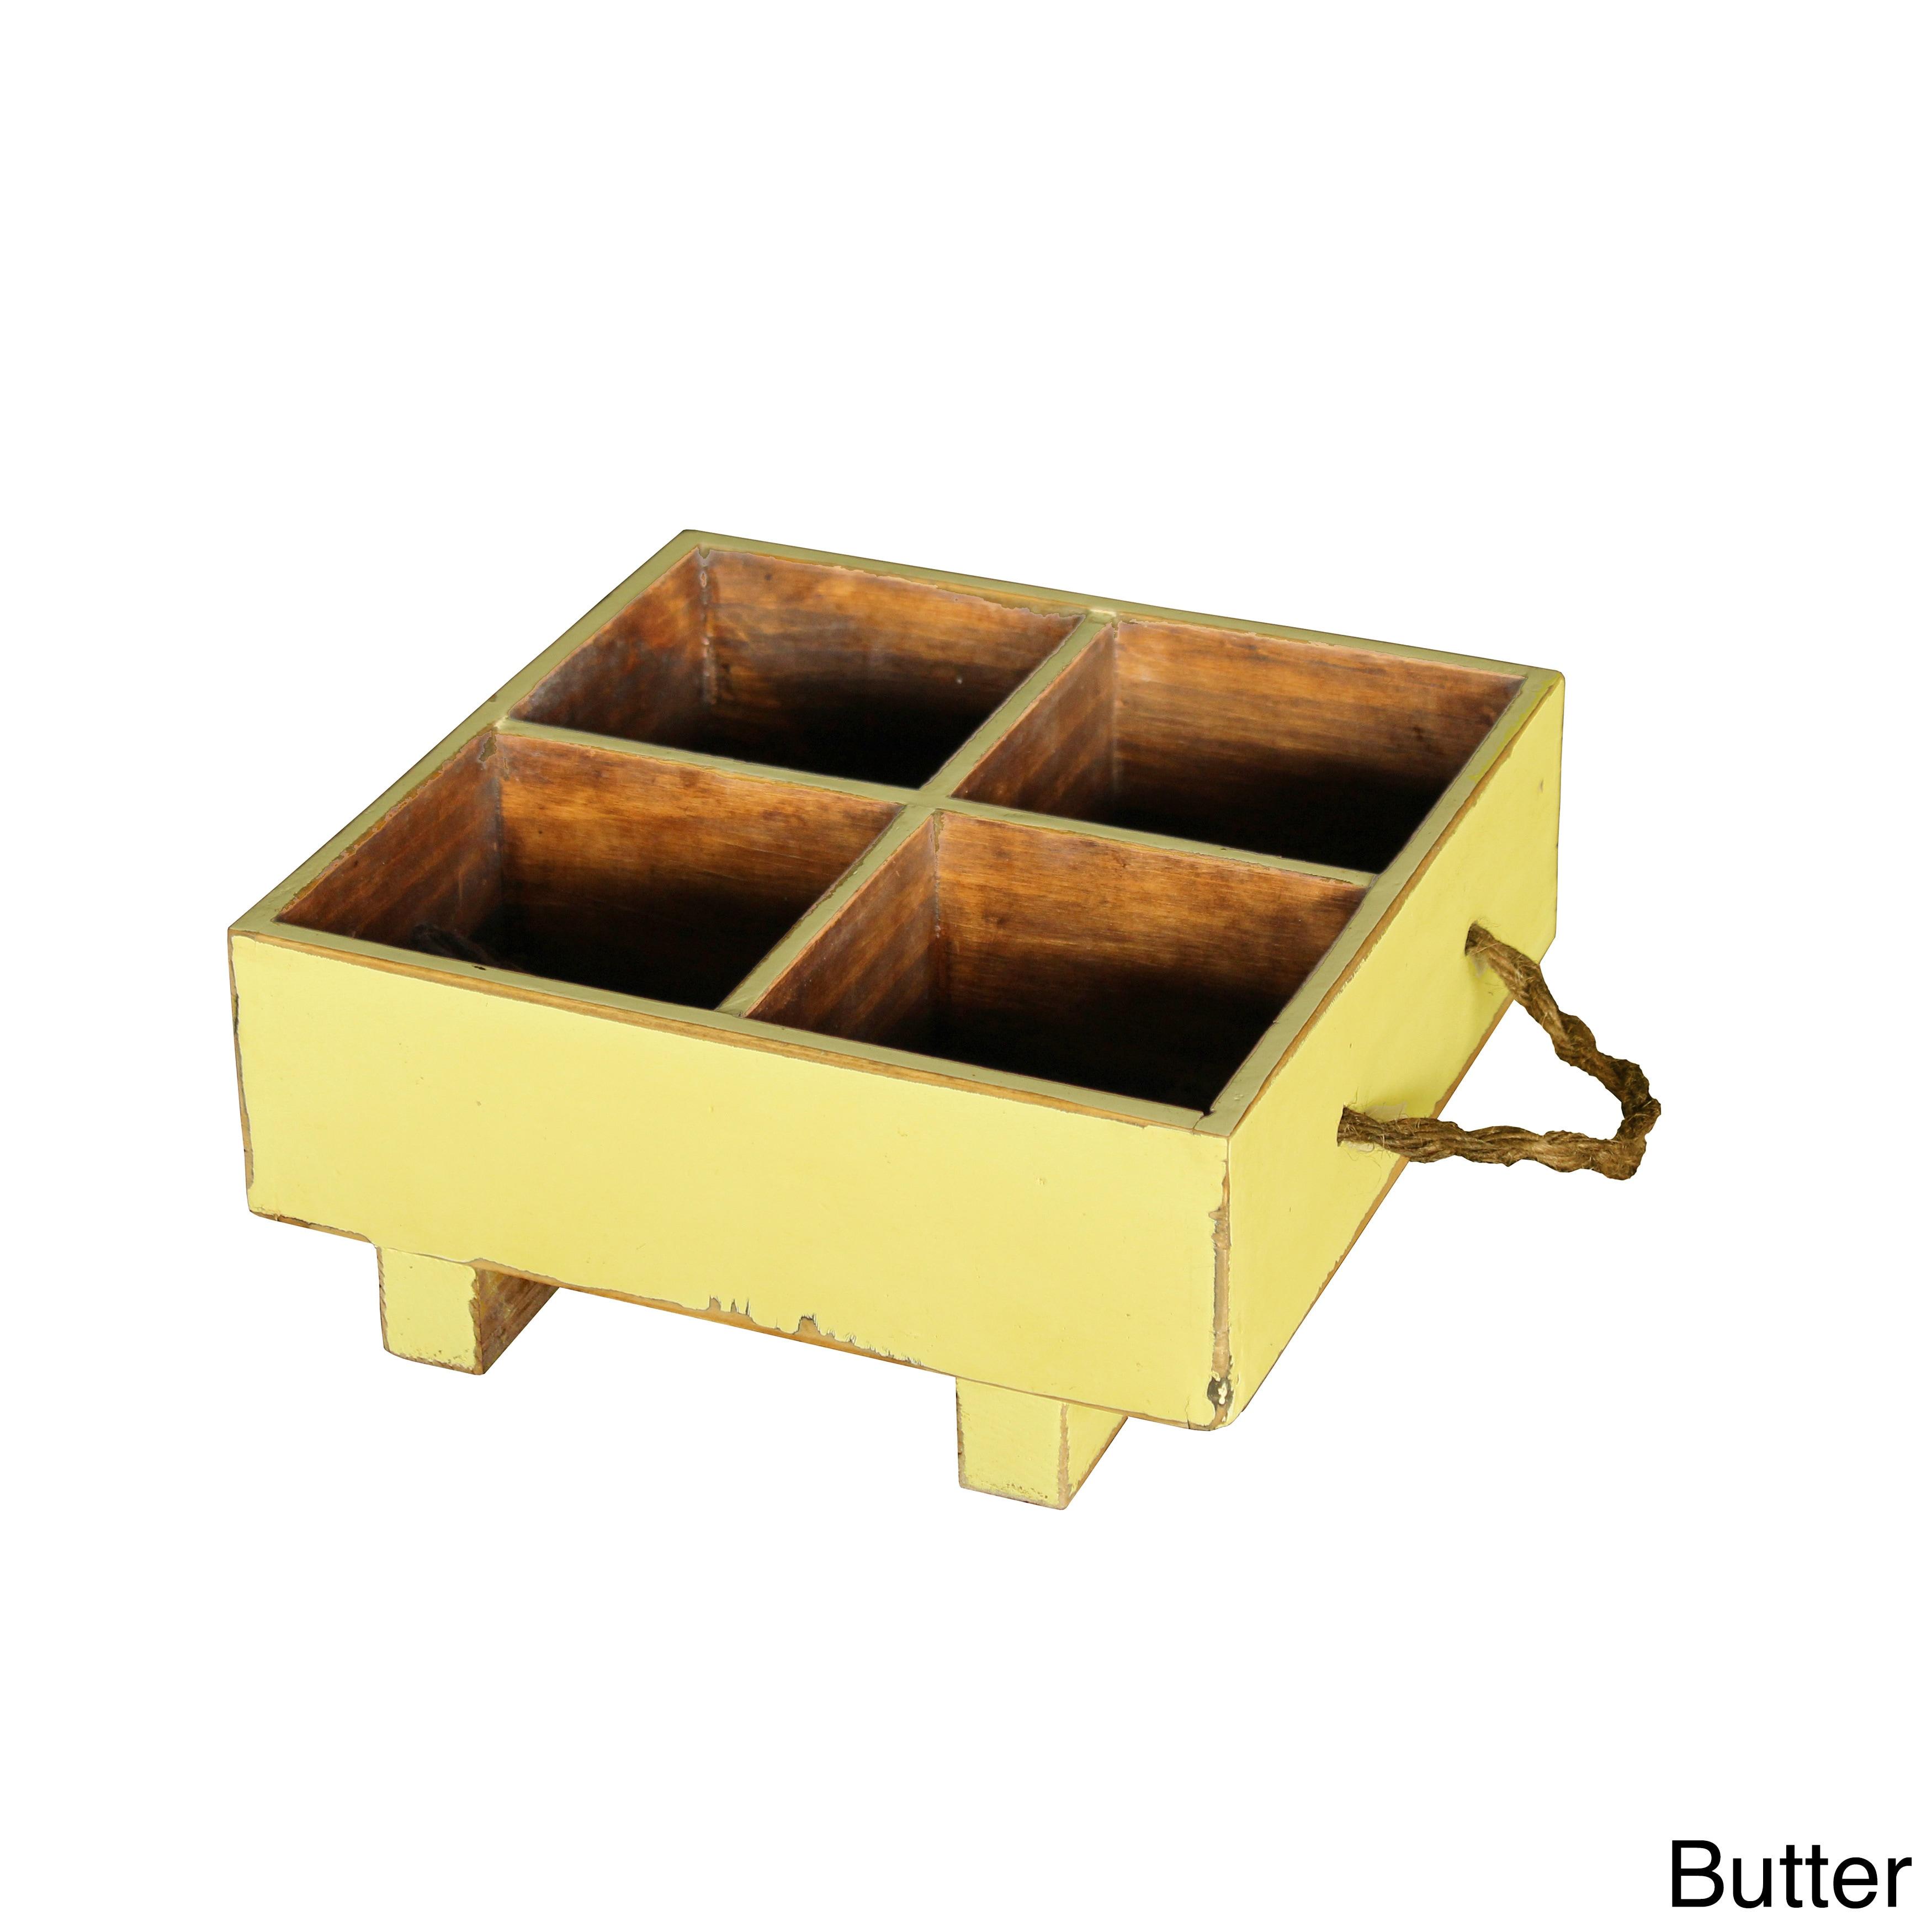 Antique Revival Vintage European-style Milk Crate (Yellow...